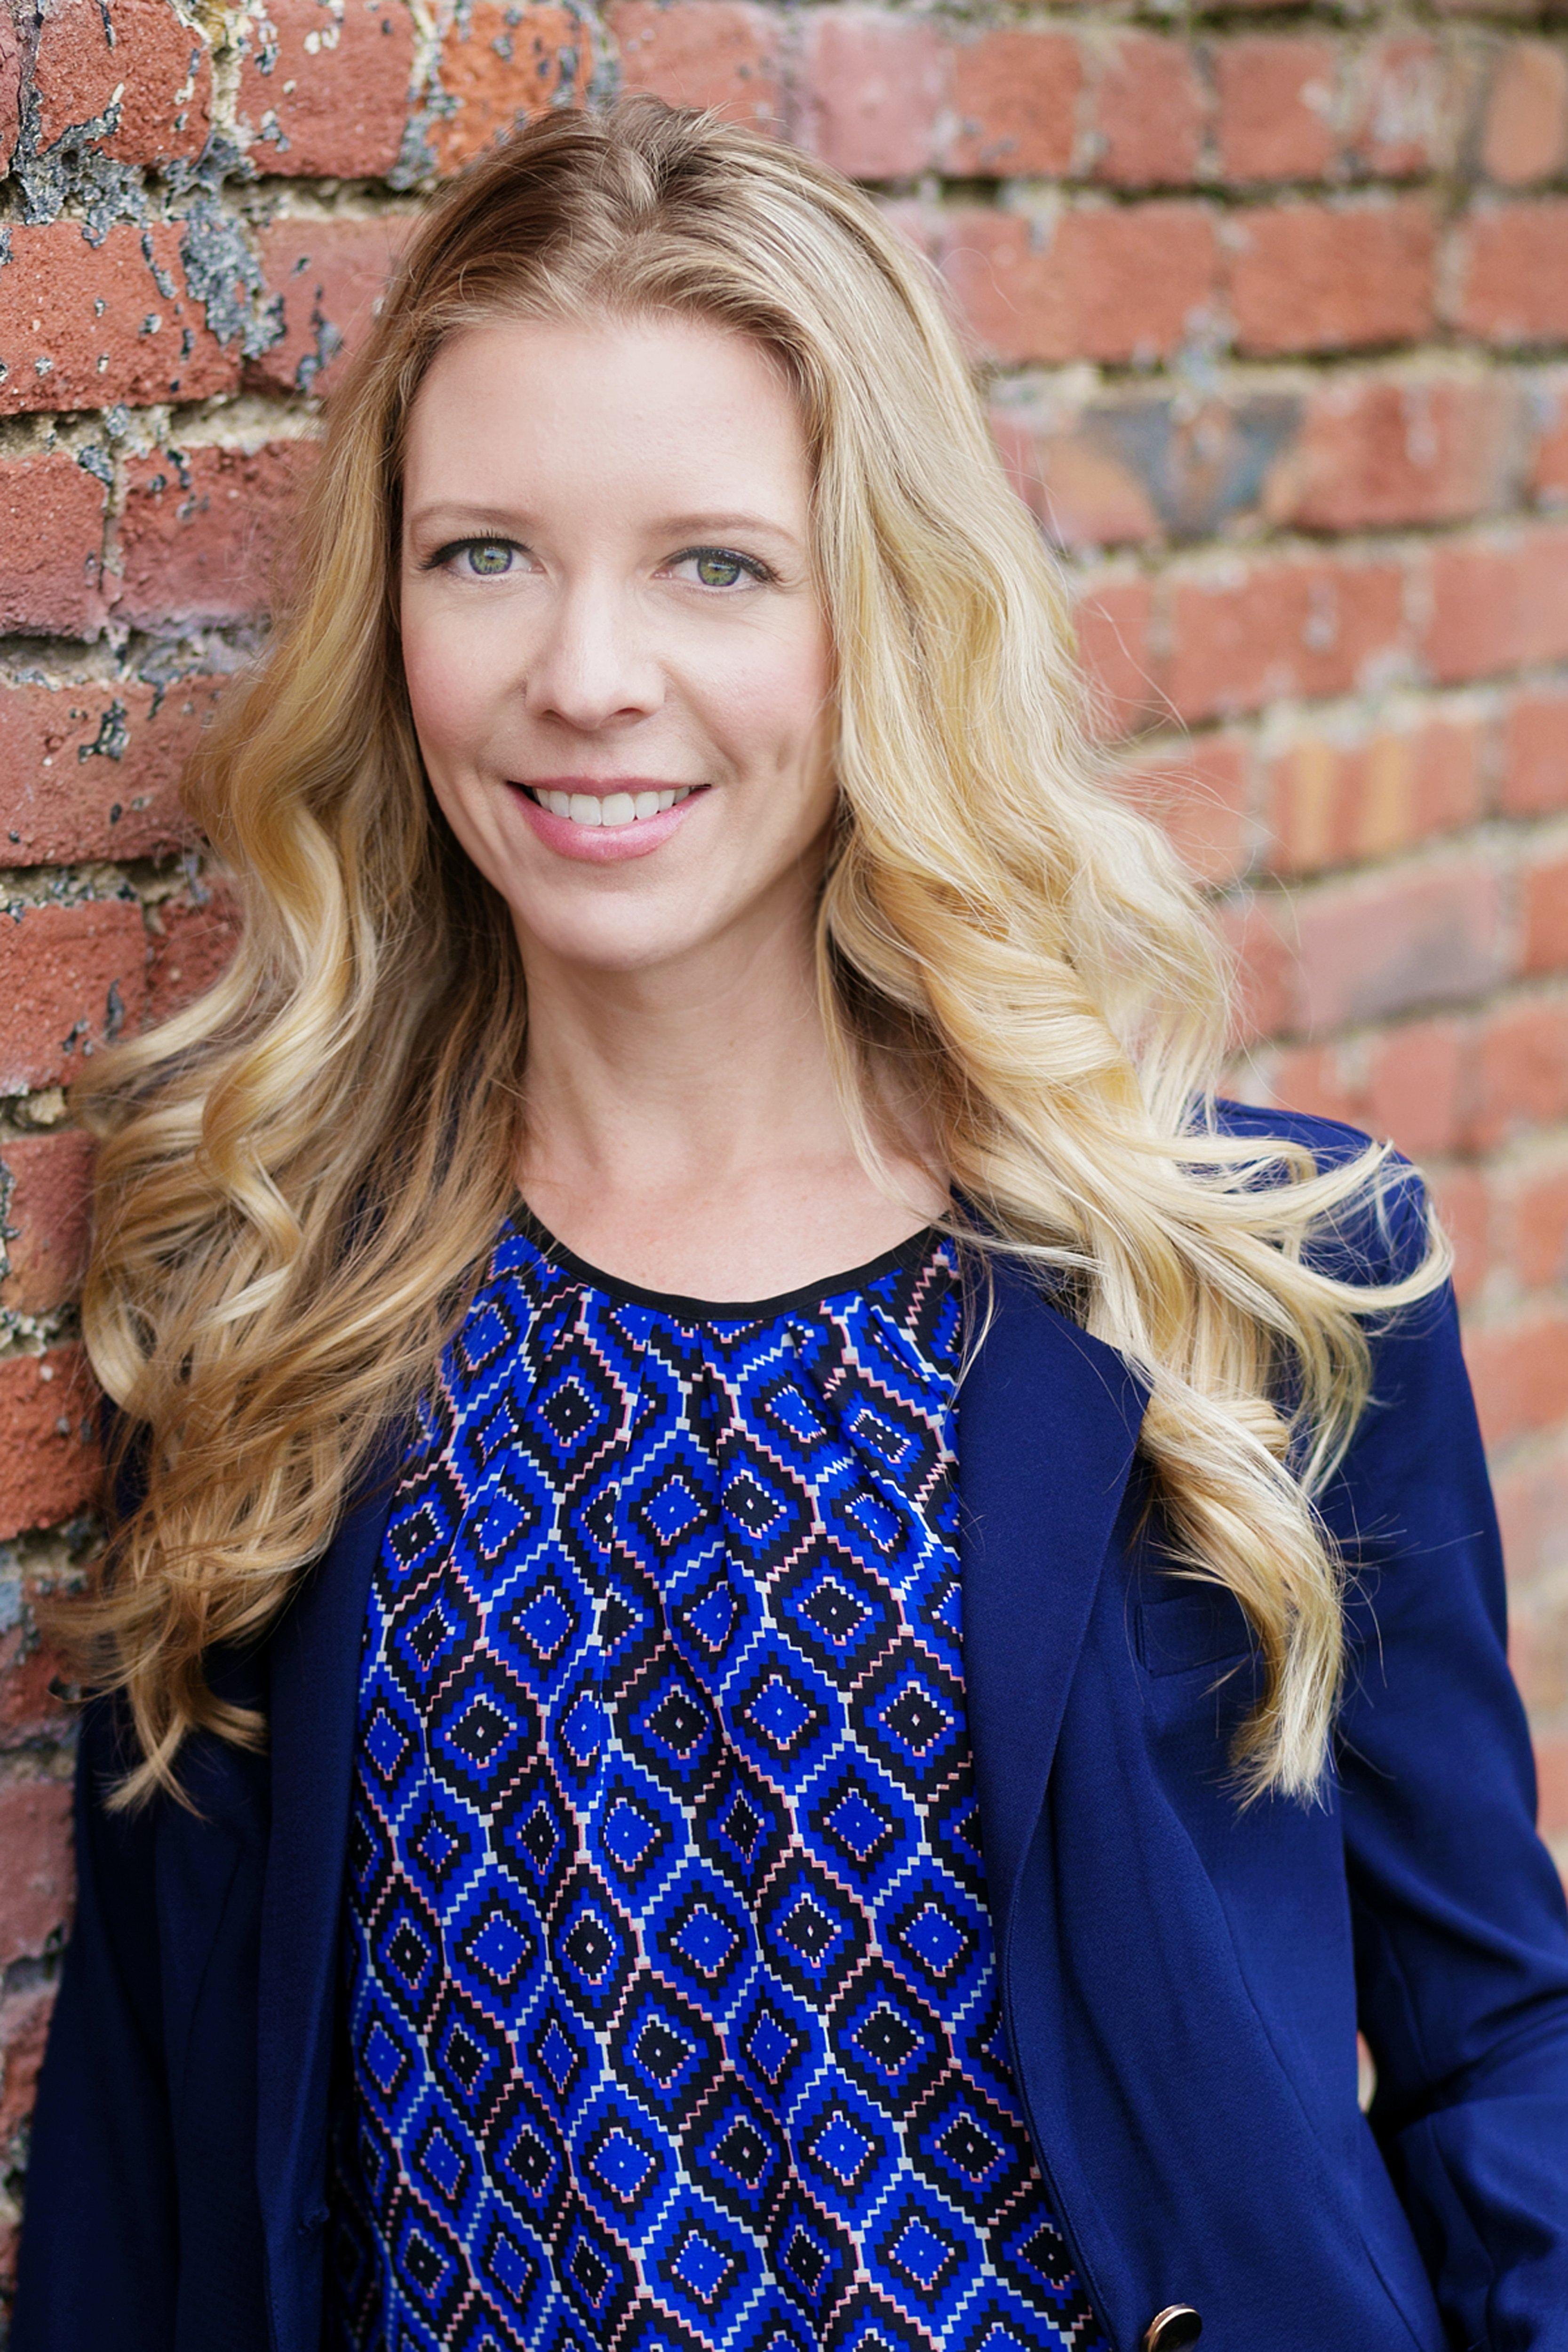 Stacey Hagen